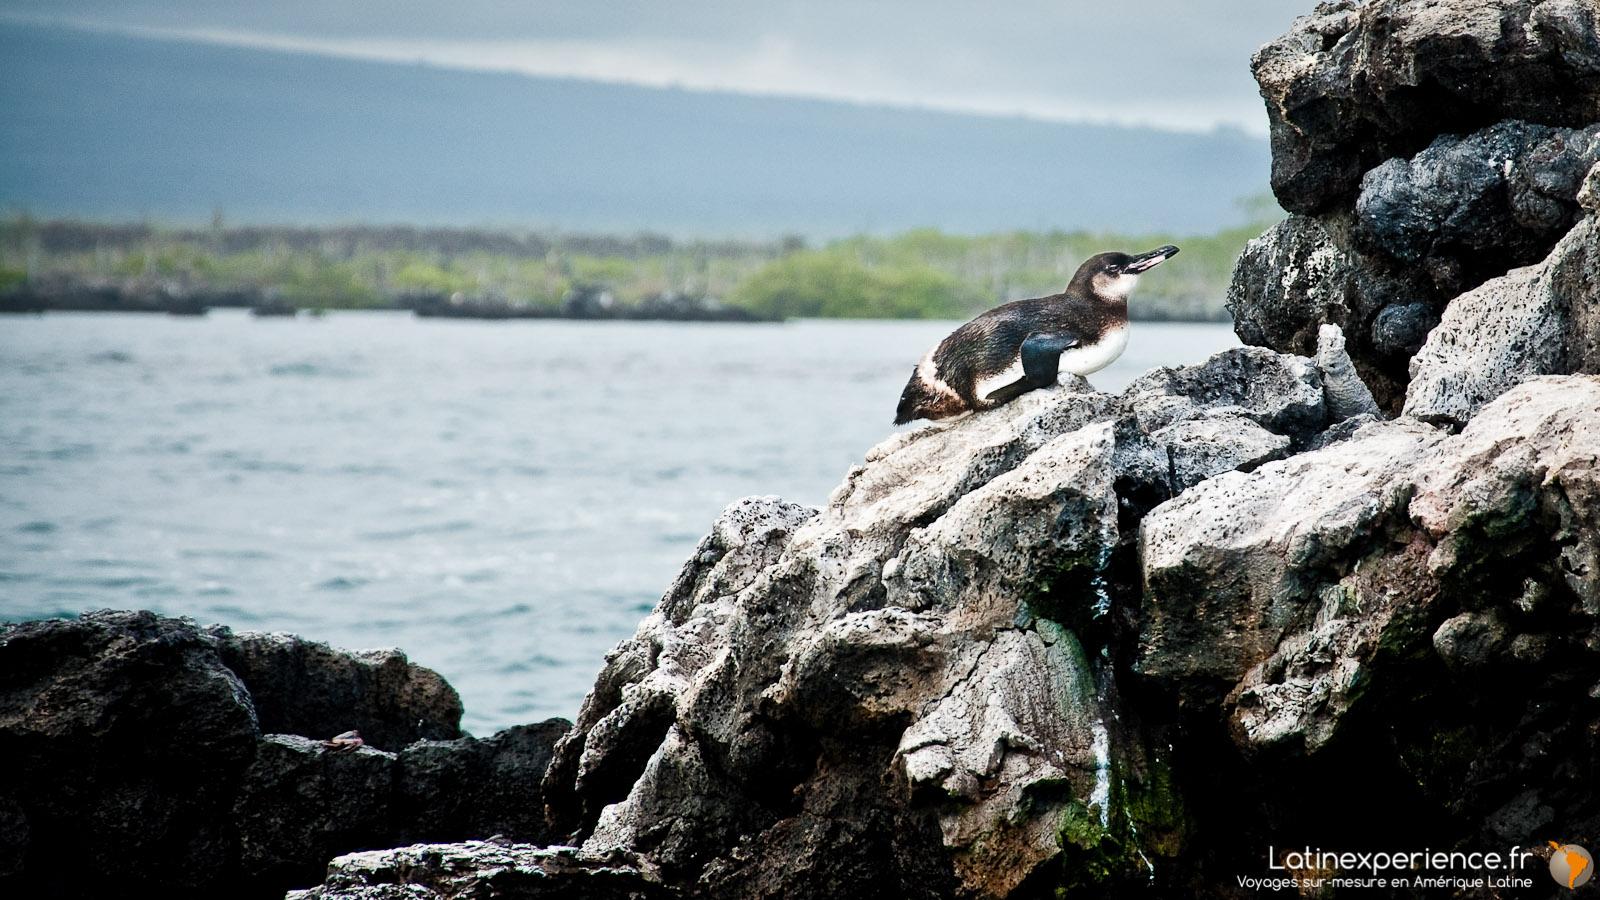 Galapagos - Los Tuneles - Pingouin - Latinexperience voyages